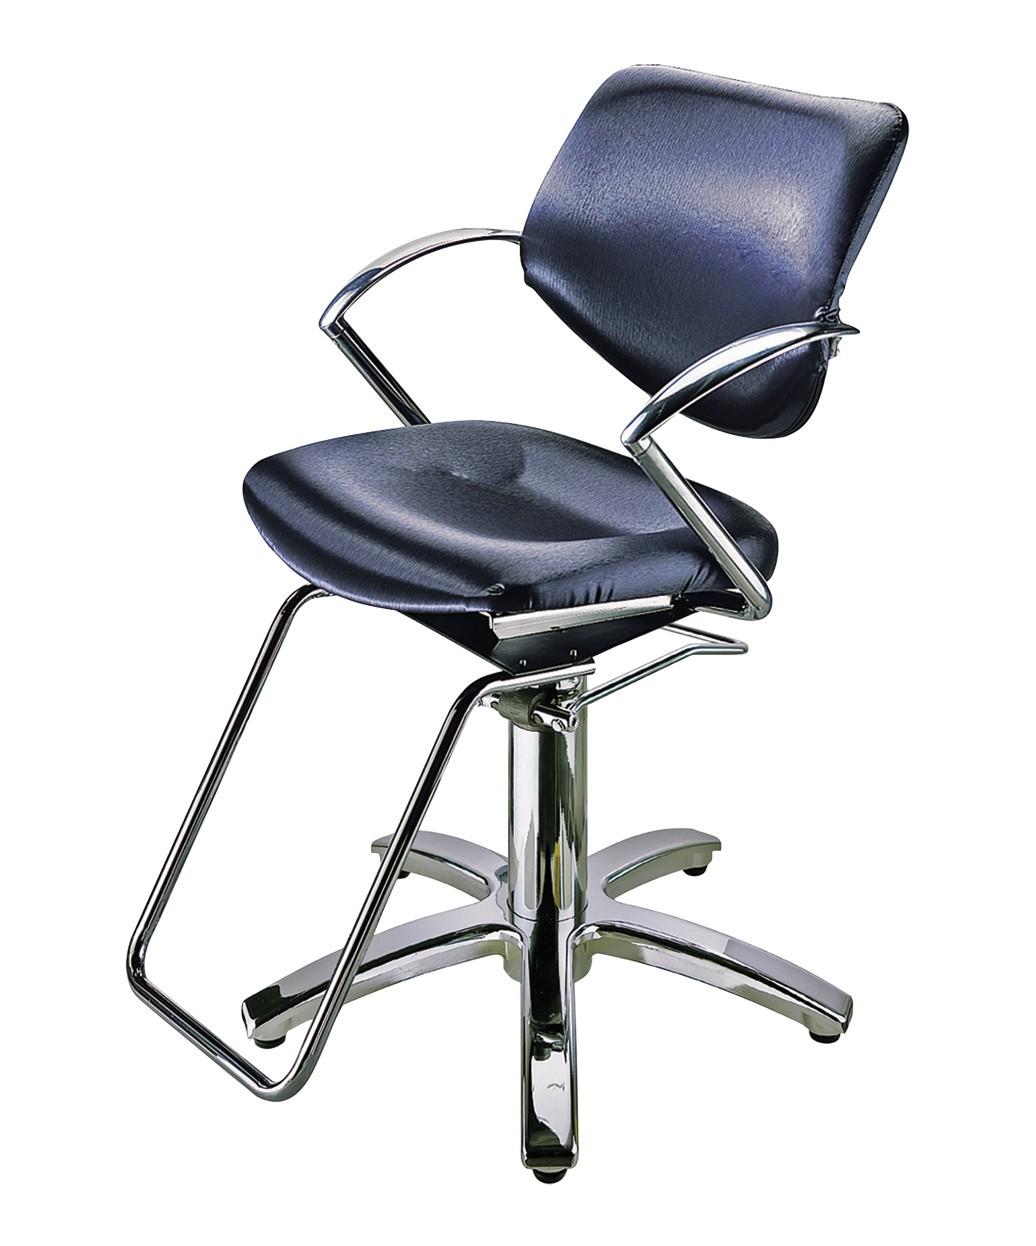 belmont salon chair dining room chairs singapore takara st 790 sara styling